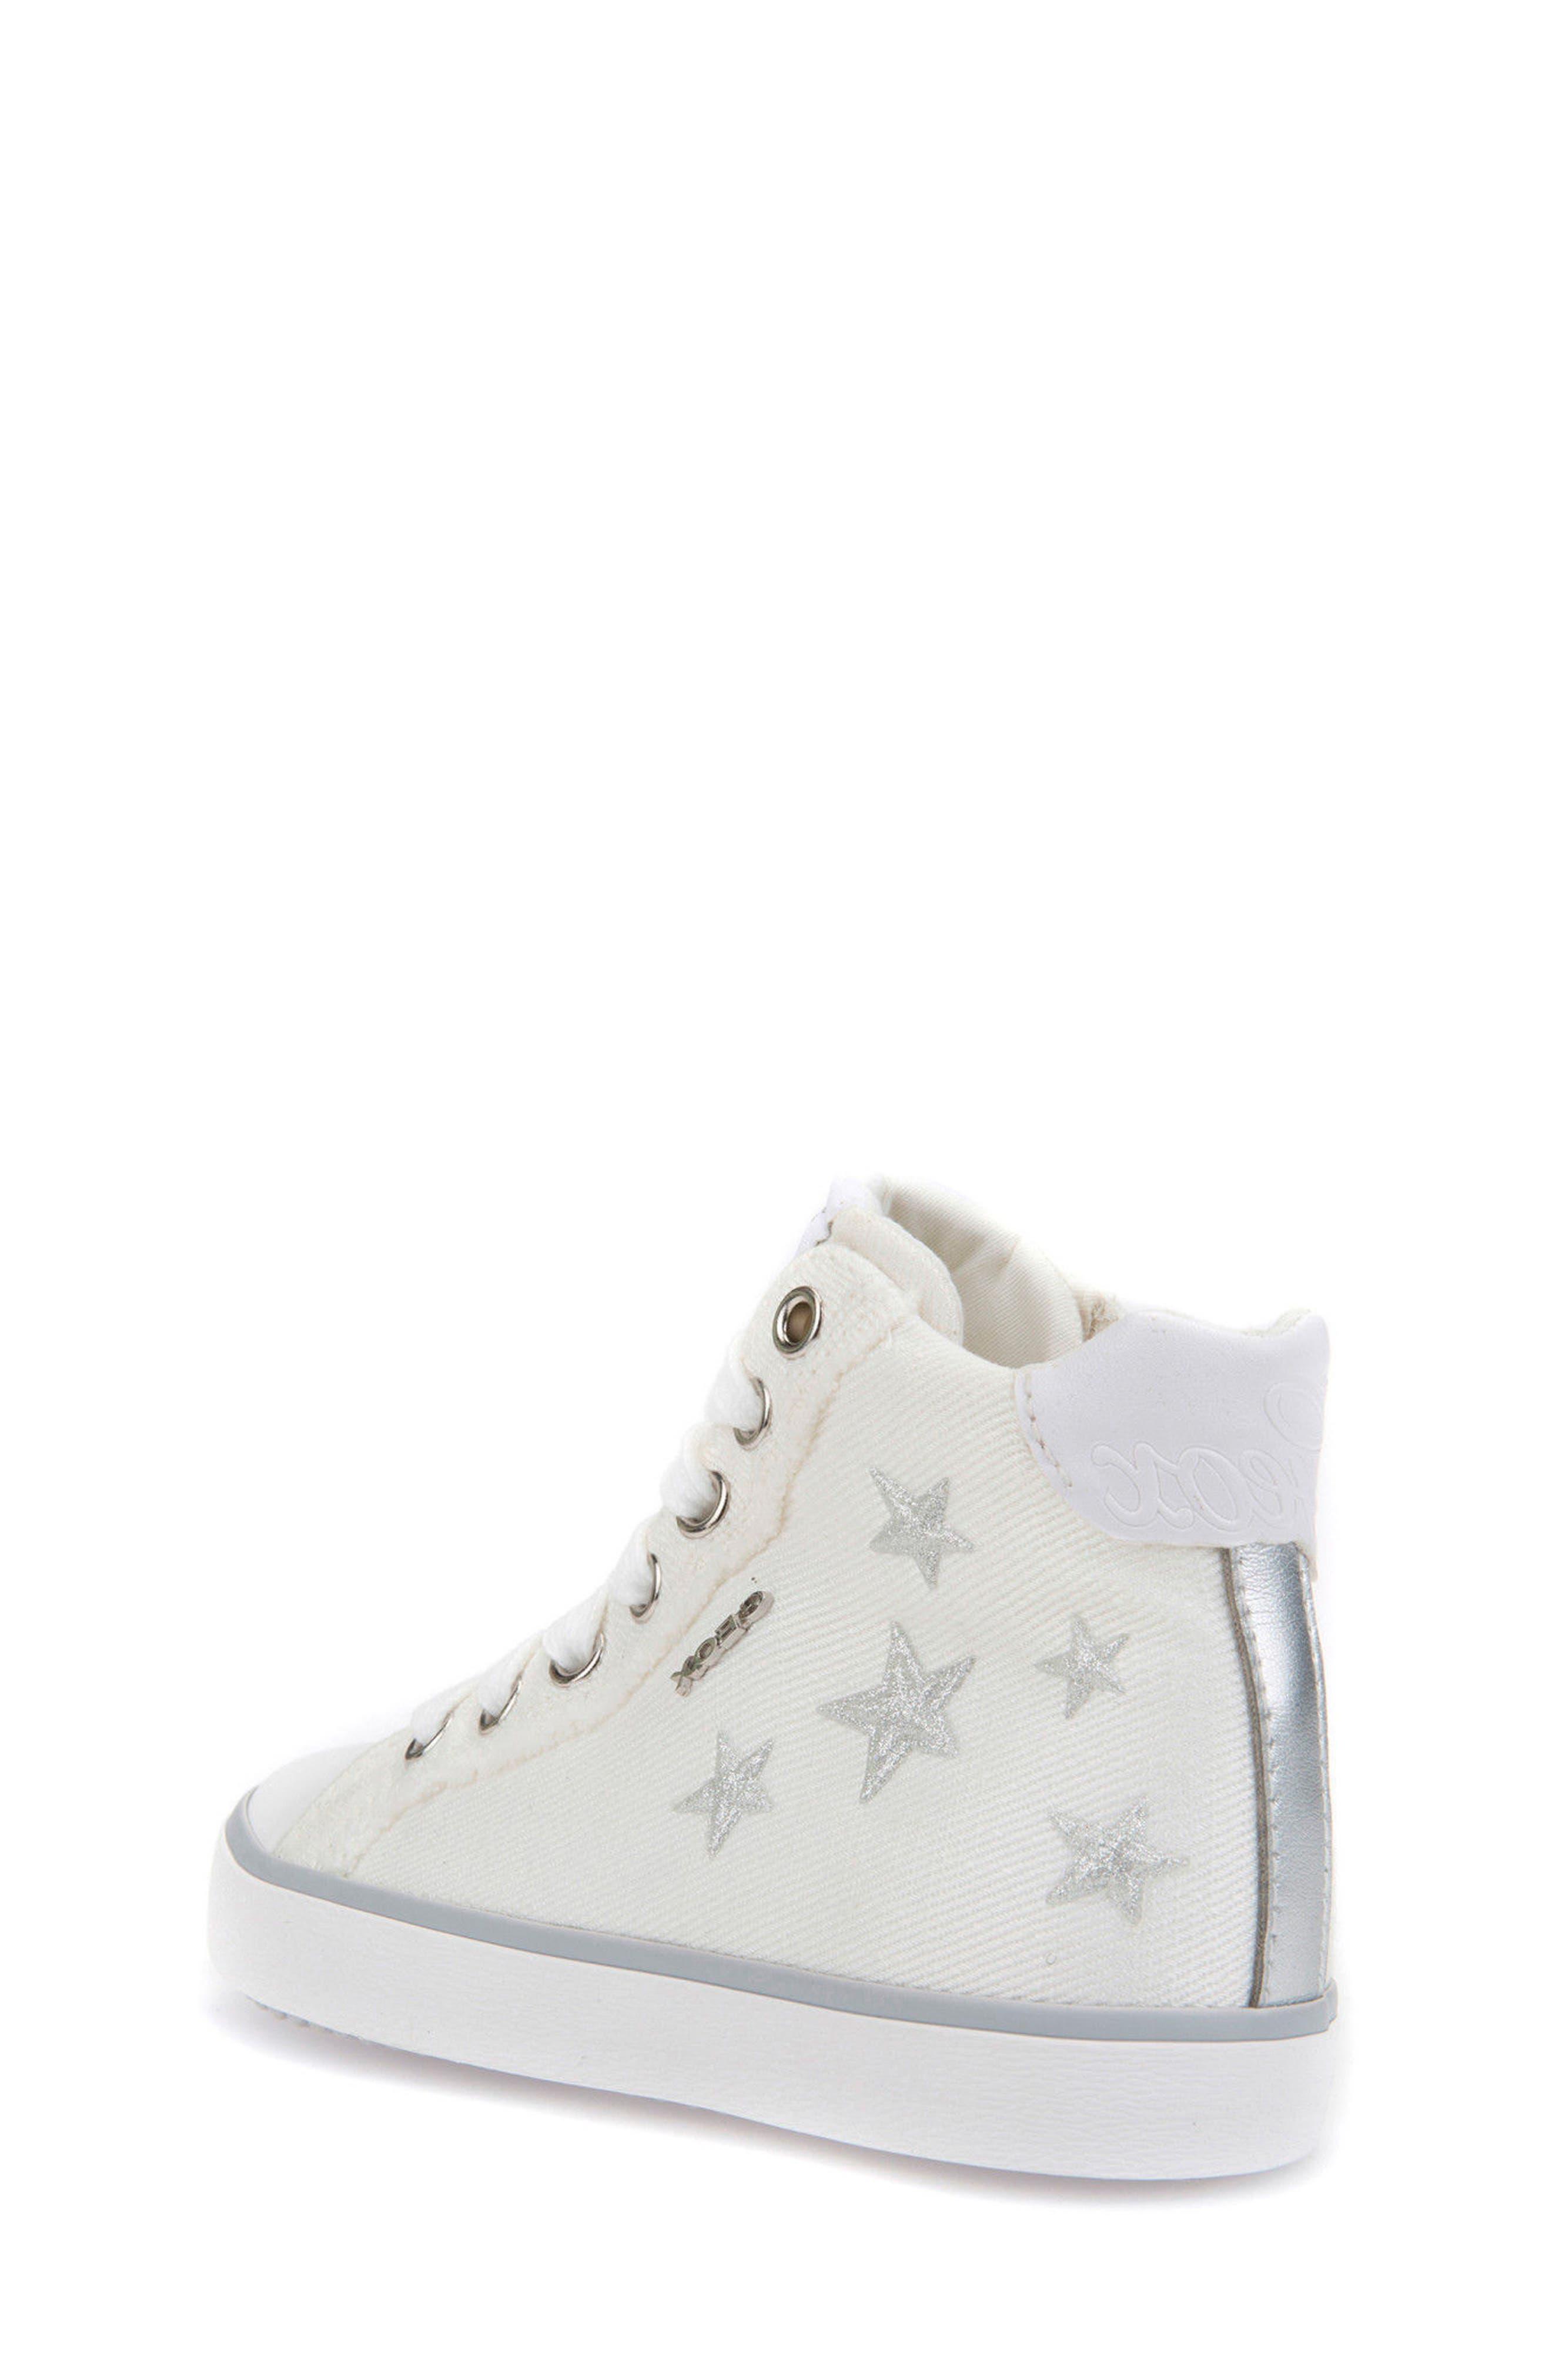 Kilwi High Top Zip Sneaker,                             Alternate thumbnail 2, color,                             WHITE